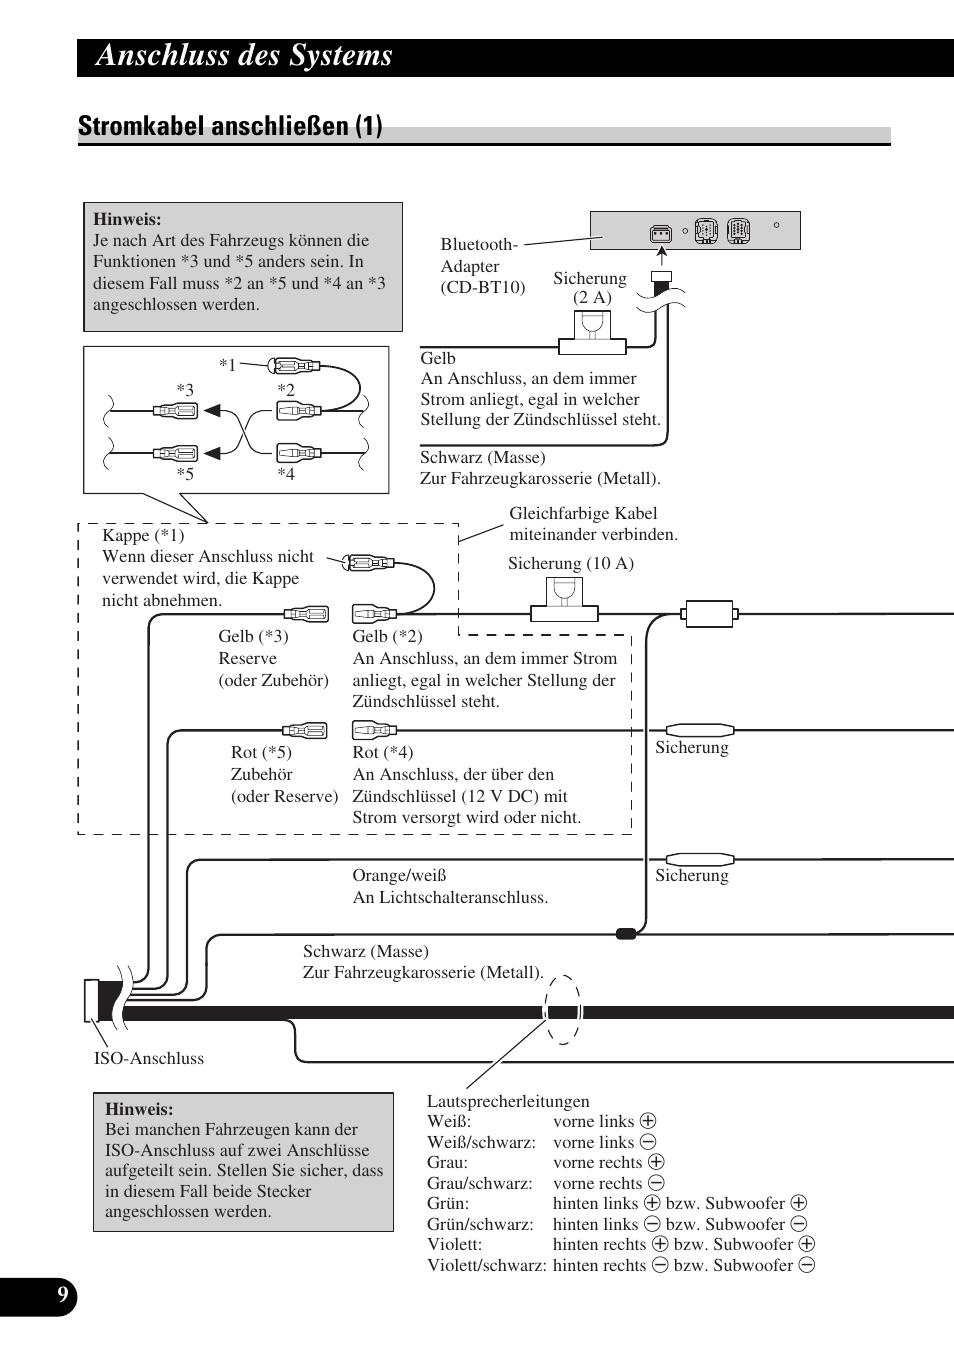 Stromkabel anschließen (1), Anschluss des systems